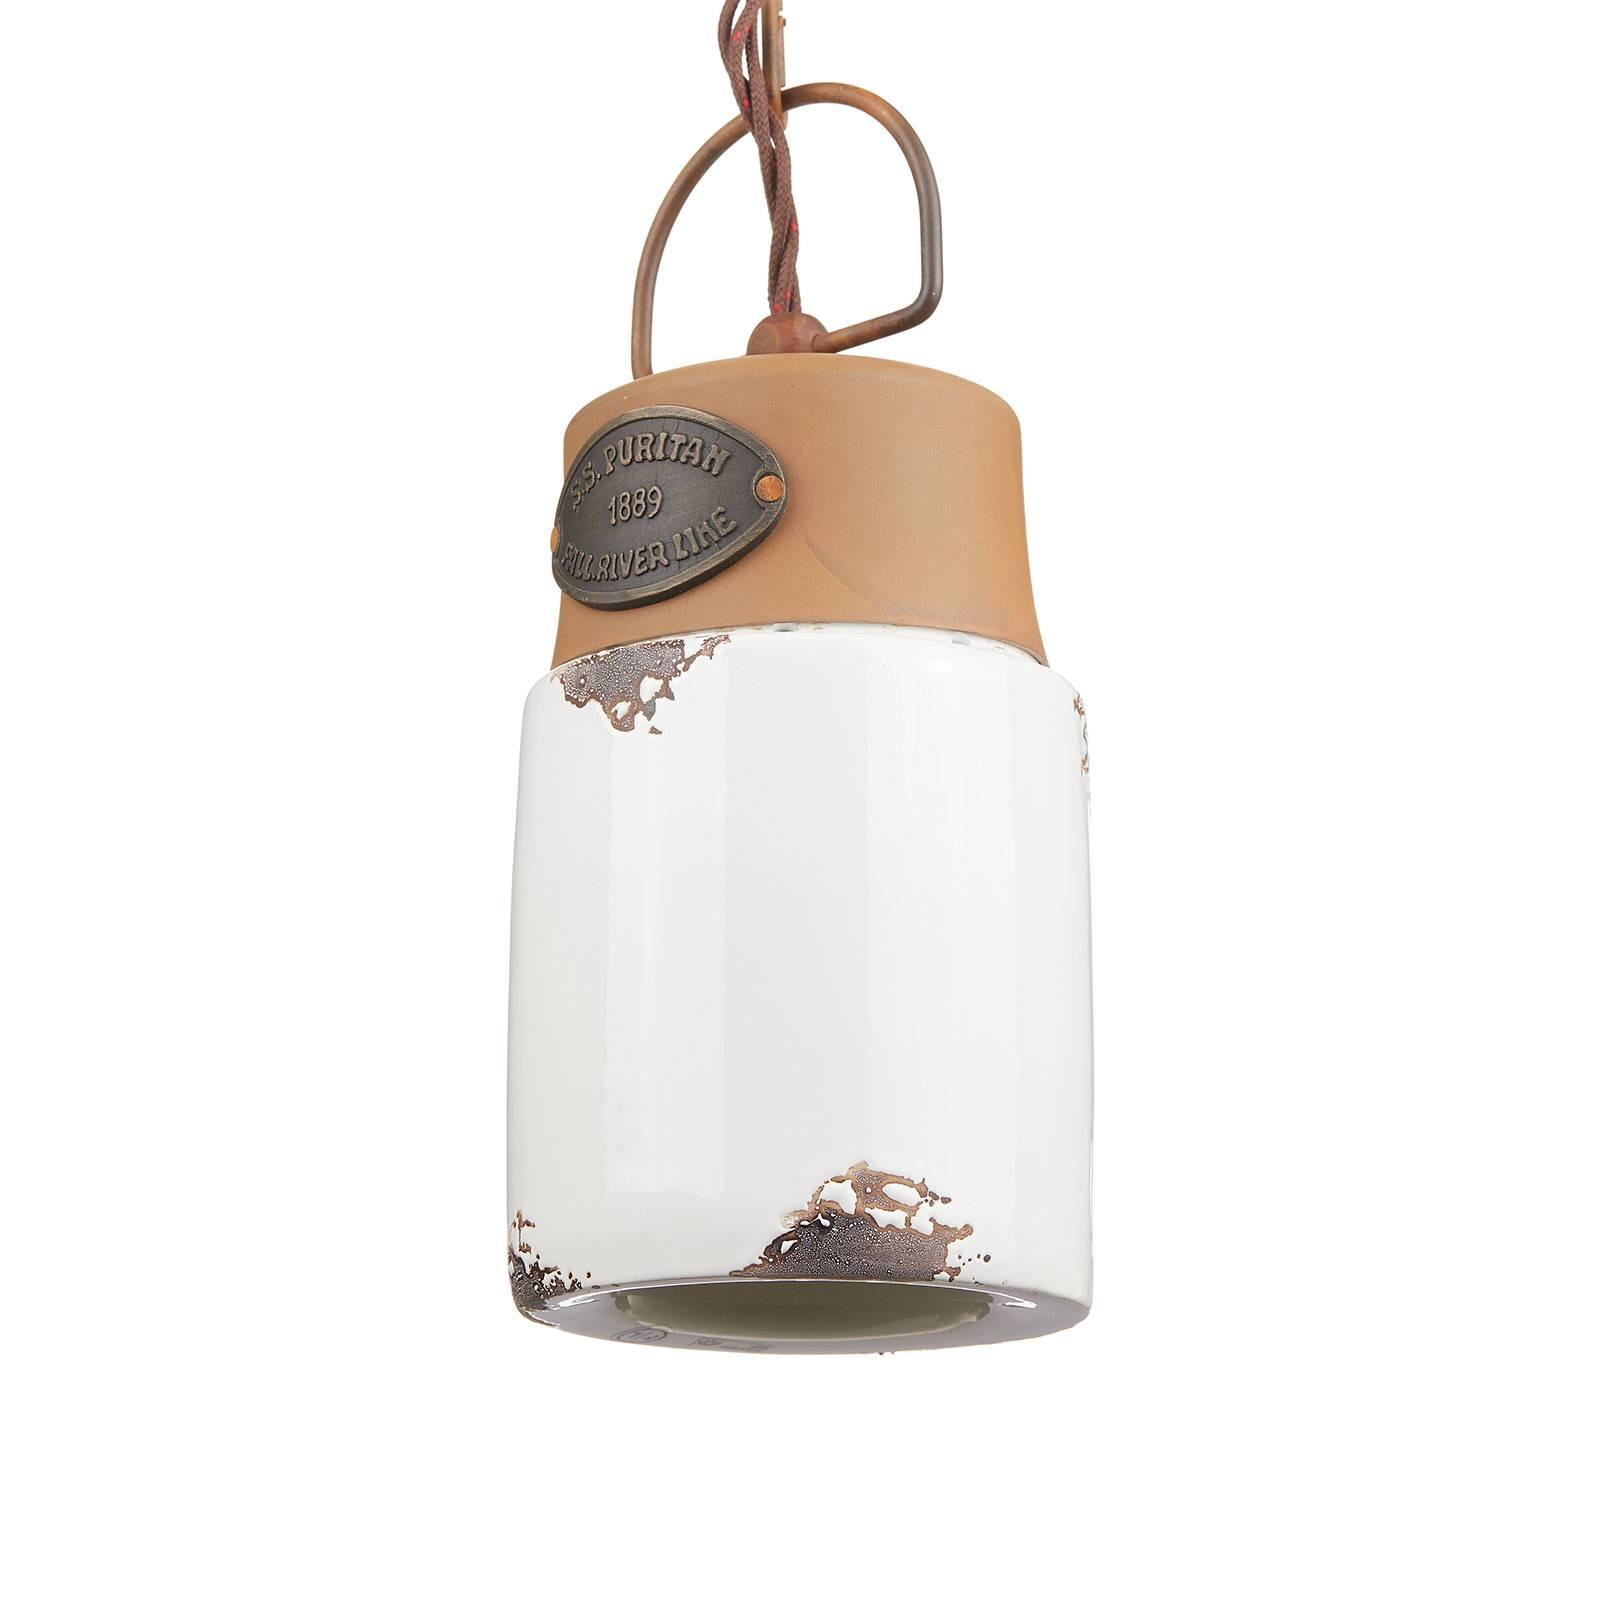 Hanglamp C1620, keramiek en metaal, wit